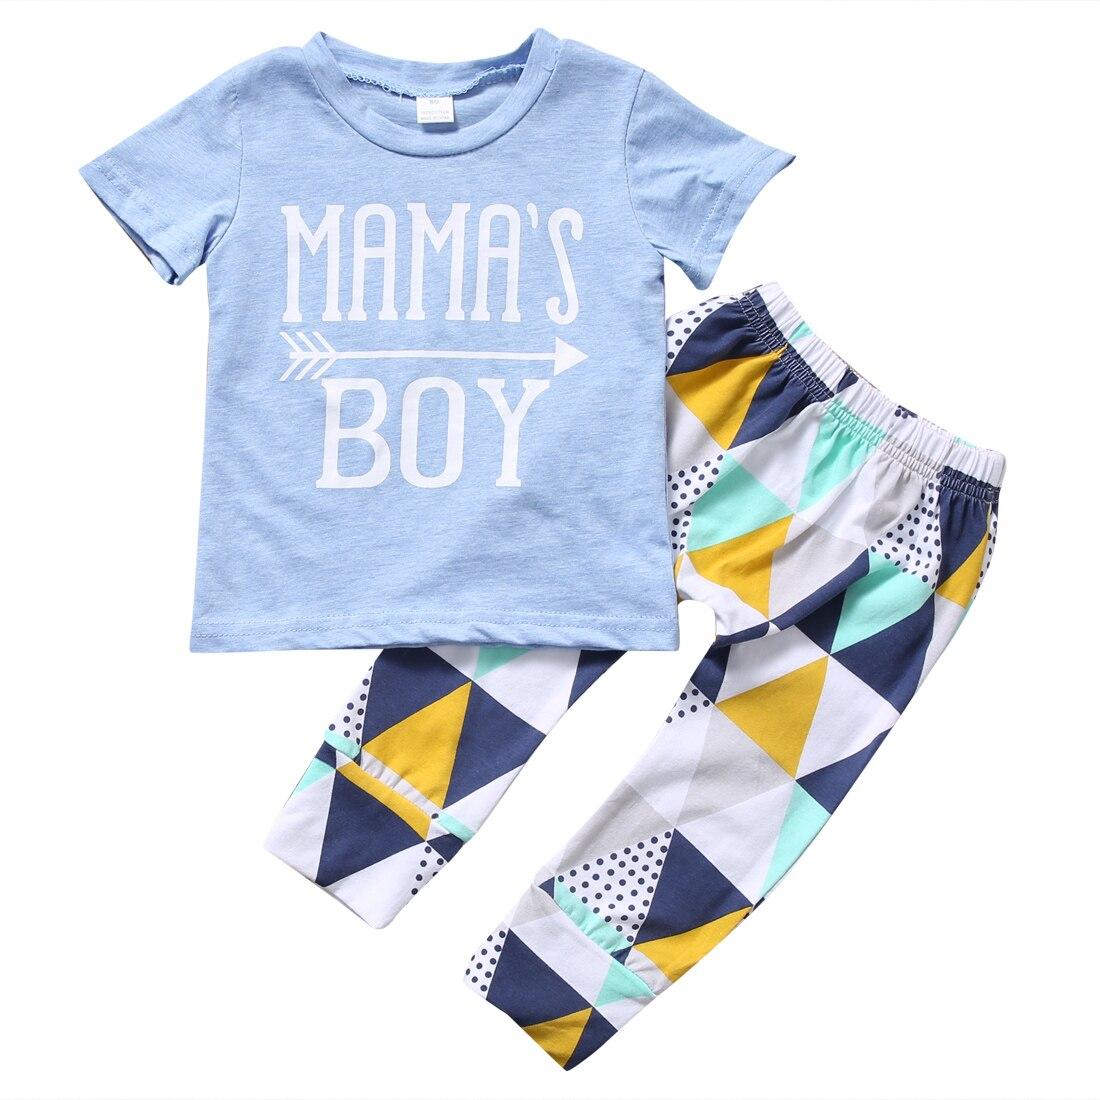 Summer Newborn Baby Boy Clothes mama s boy Short Sleeve T